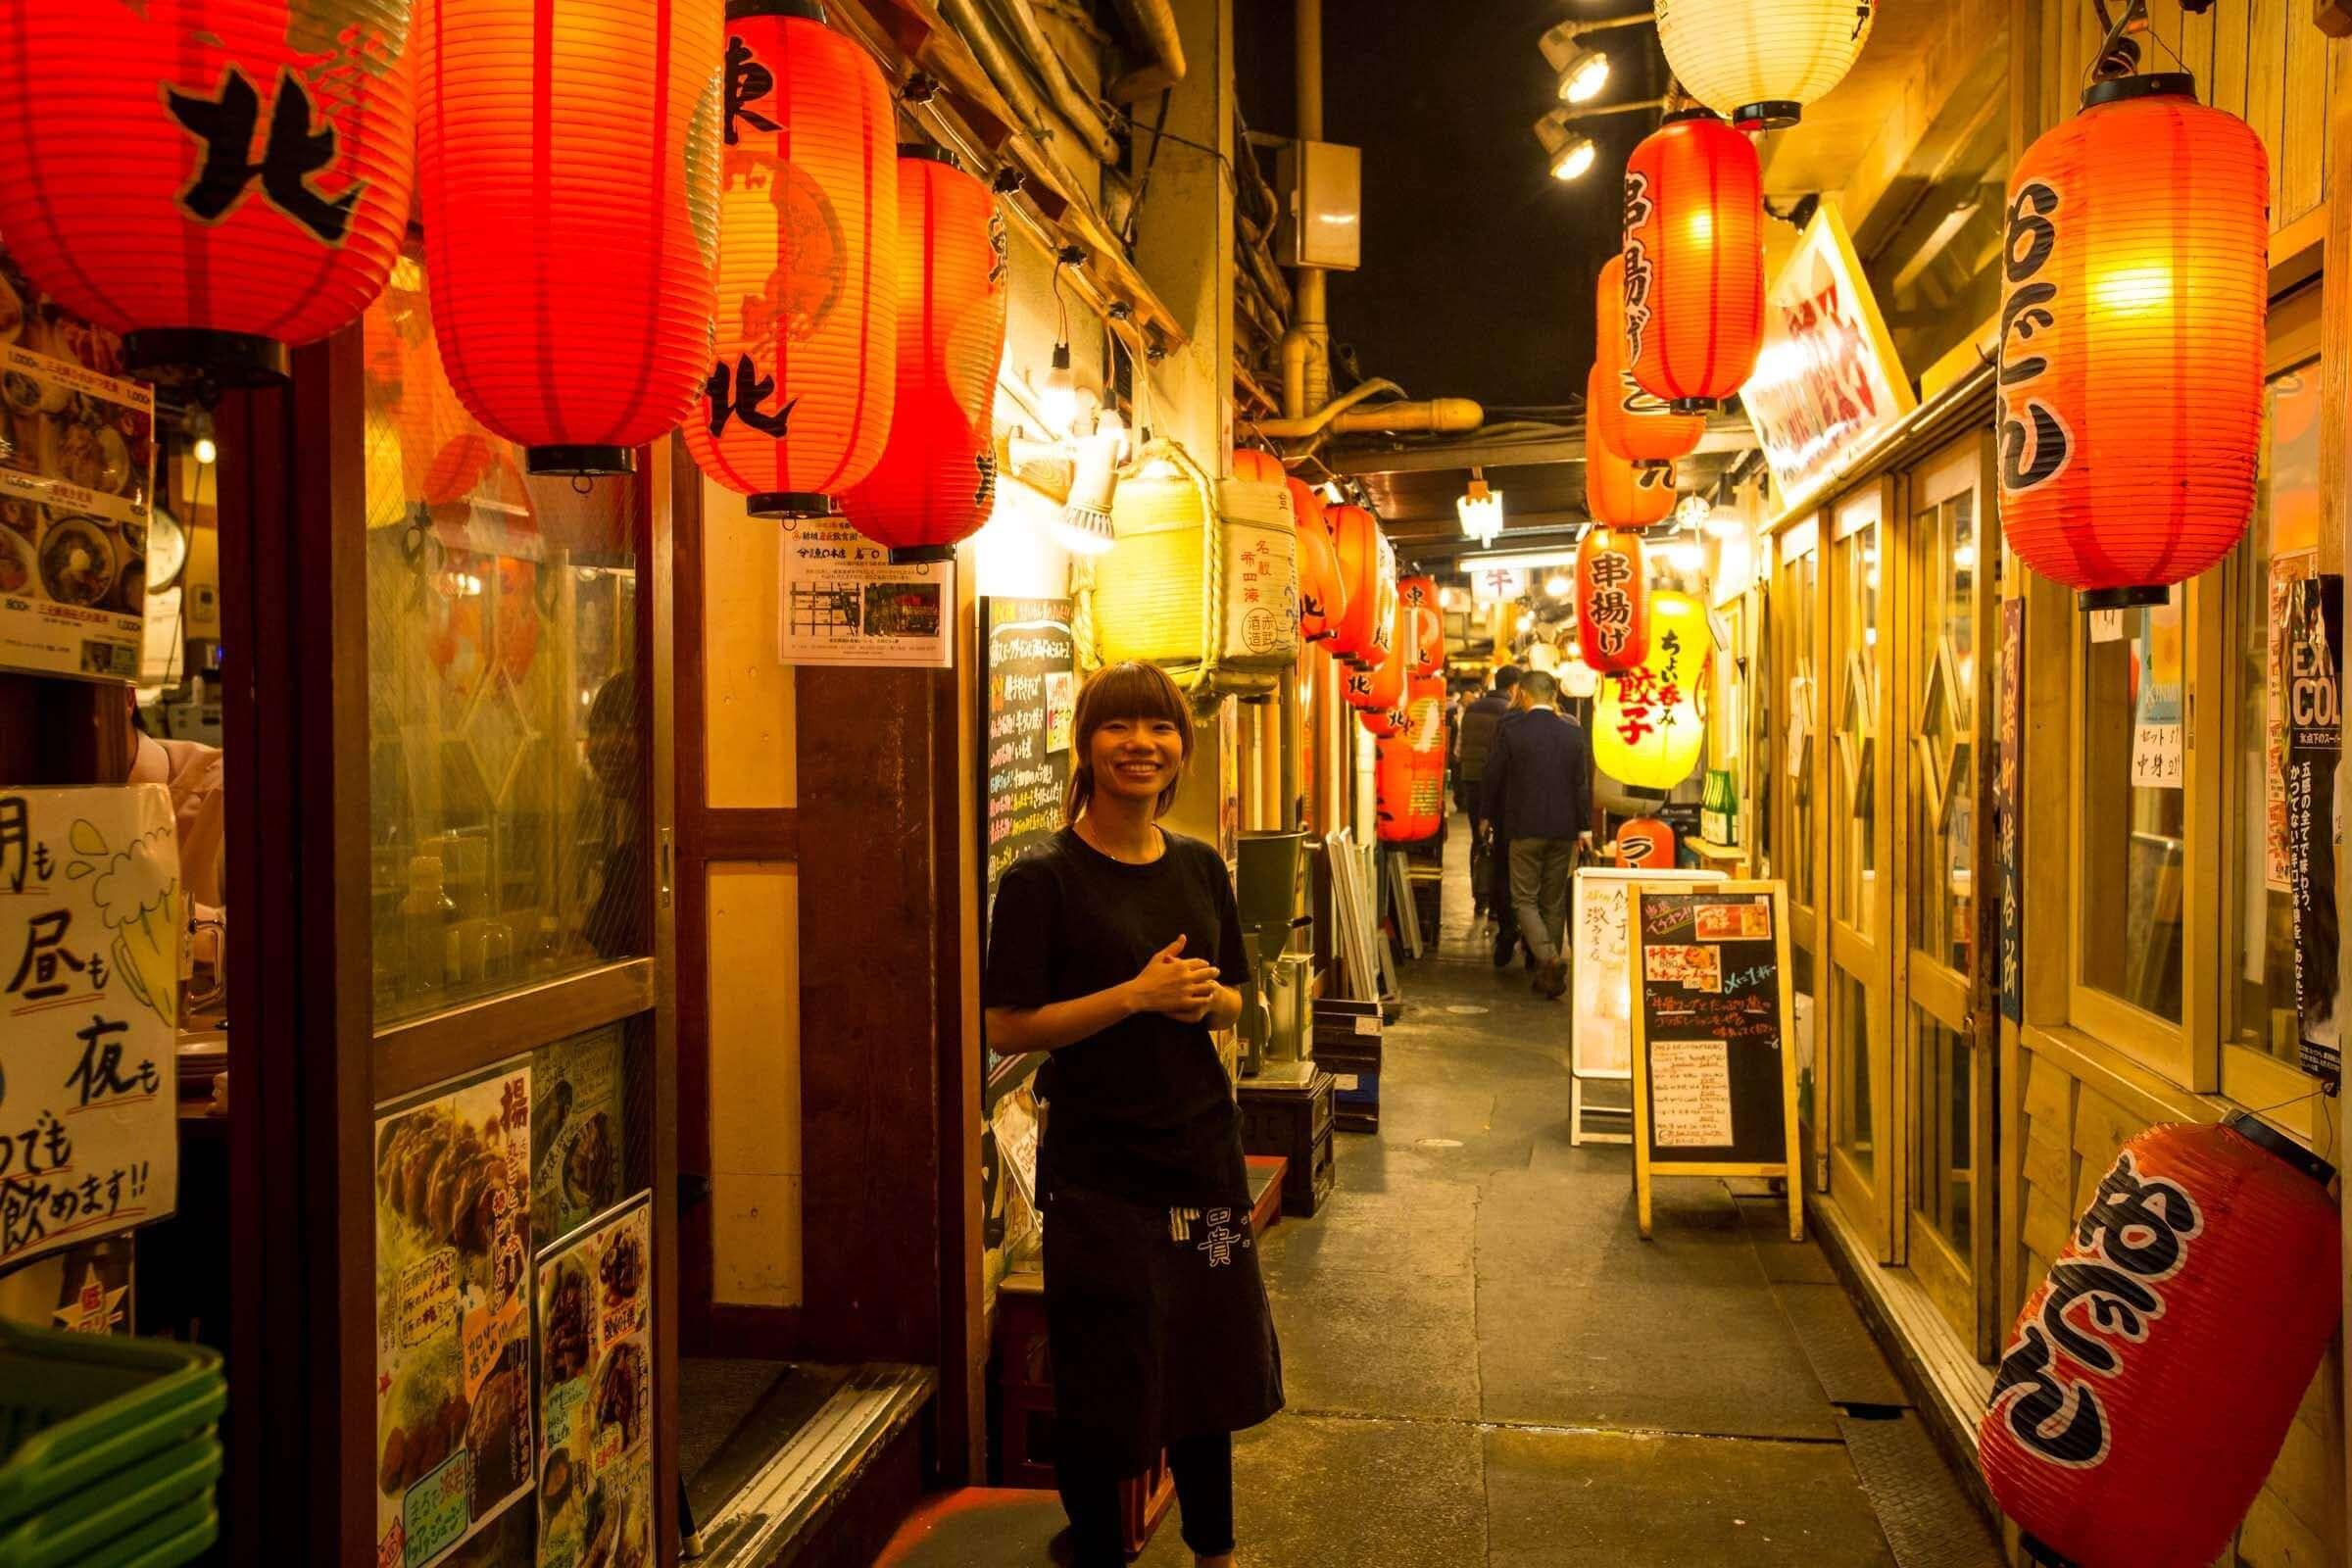 AllStar food tour Arigato Japan